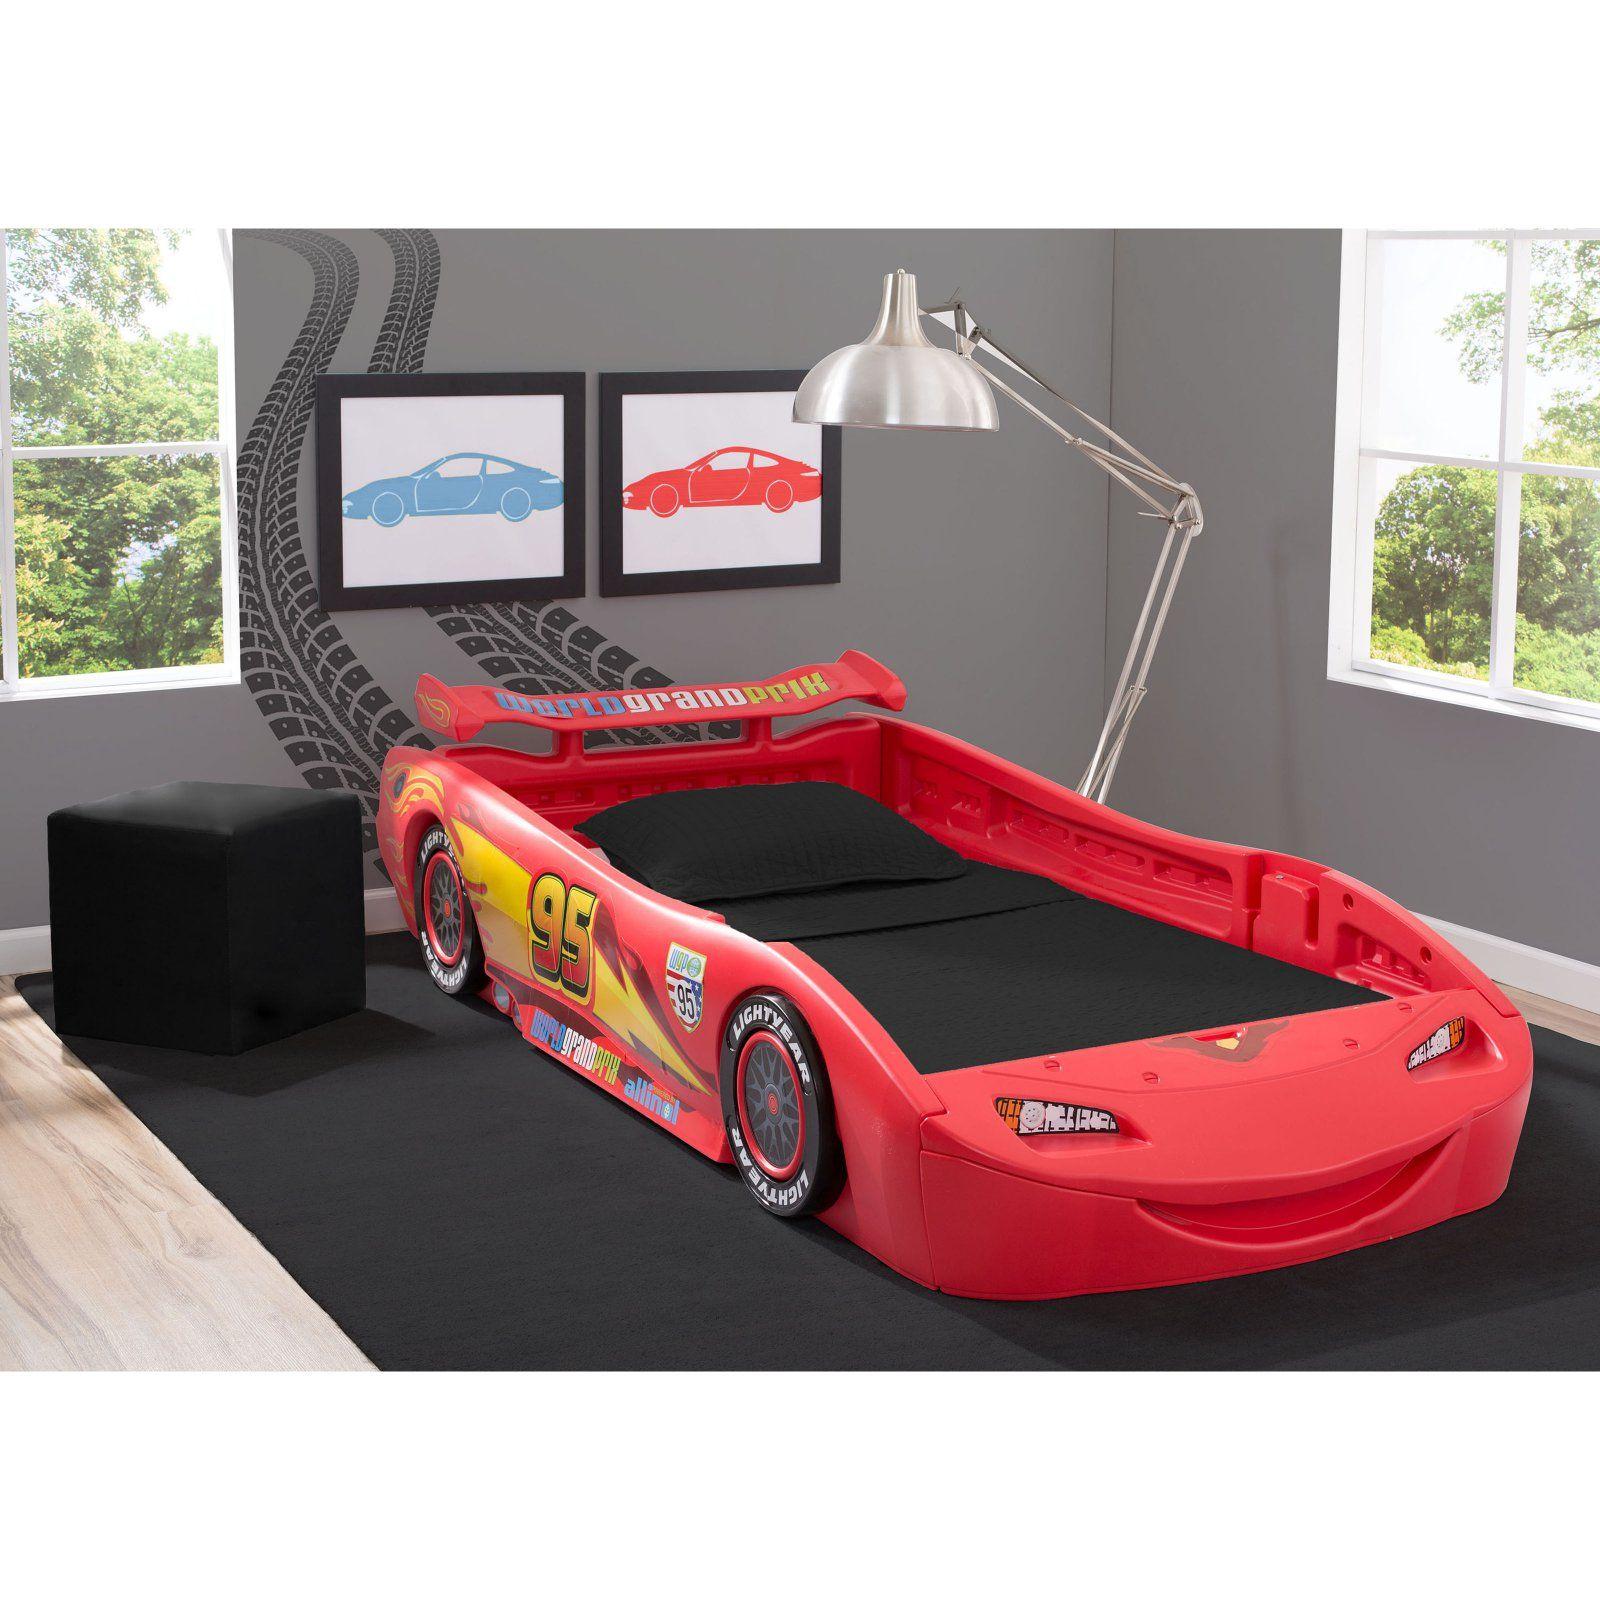 Disney Pixar Cars Lightning Mcqueen Bed With Lights Twin Car Bed Bed Lights Lightning Mcqueen Bed